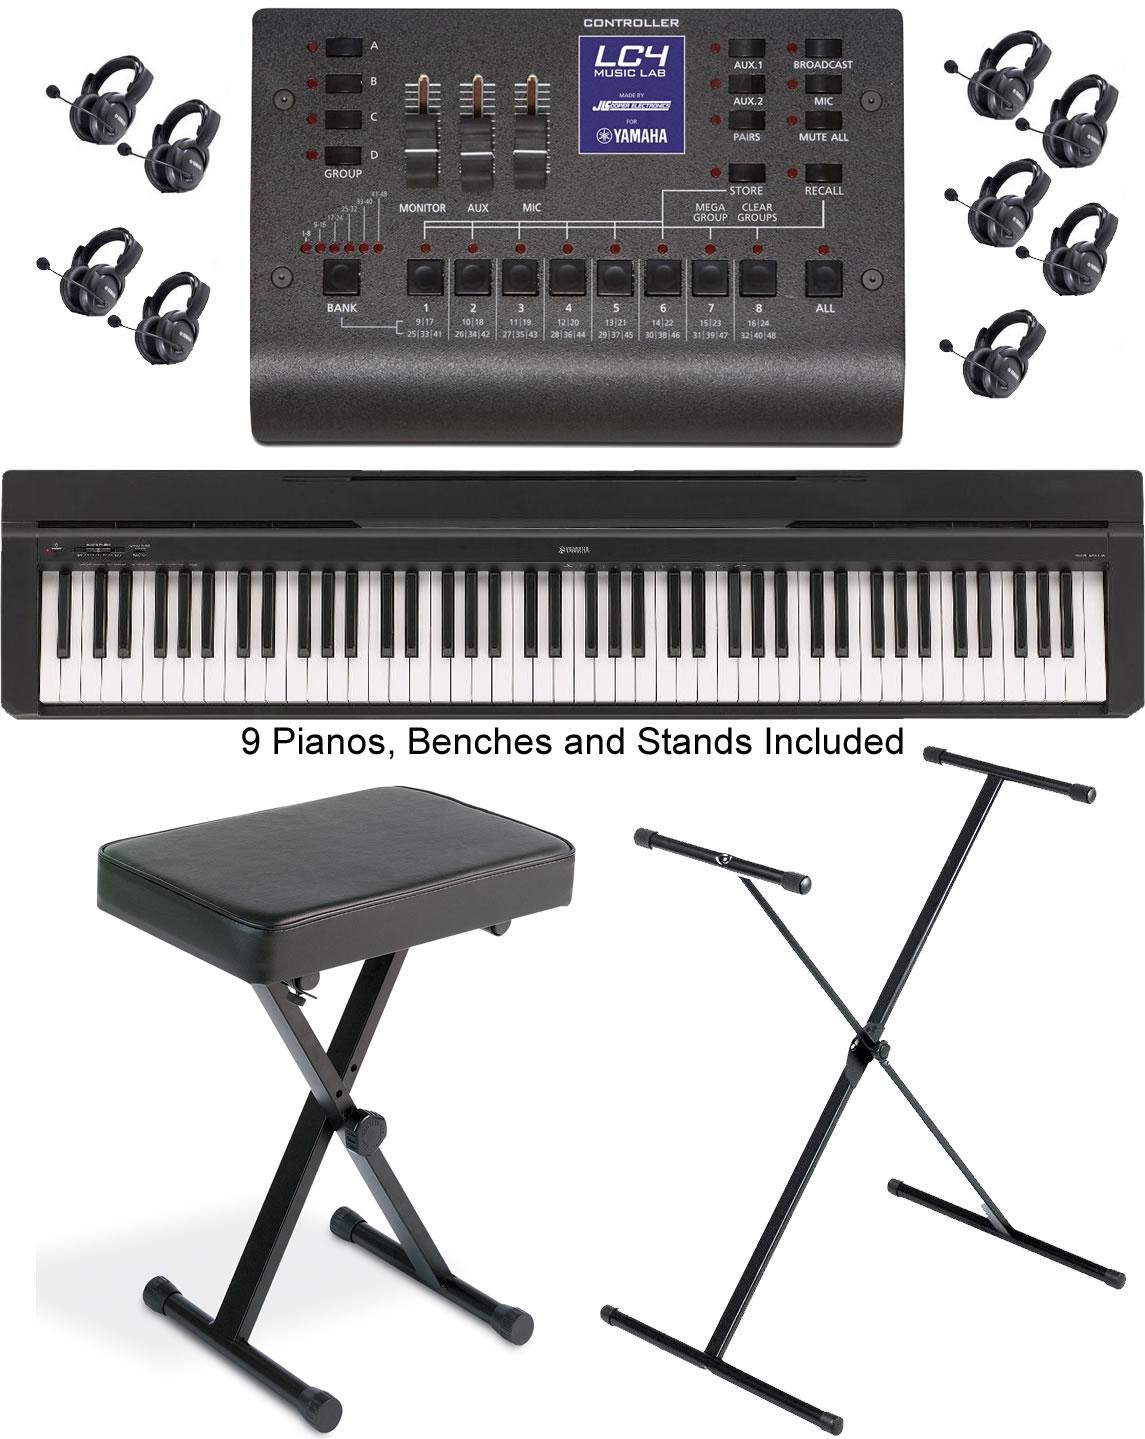 Yamaha lc4 basic music lab for 8 students and 1 teacher for Yamaha p45 keyboard